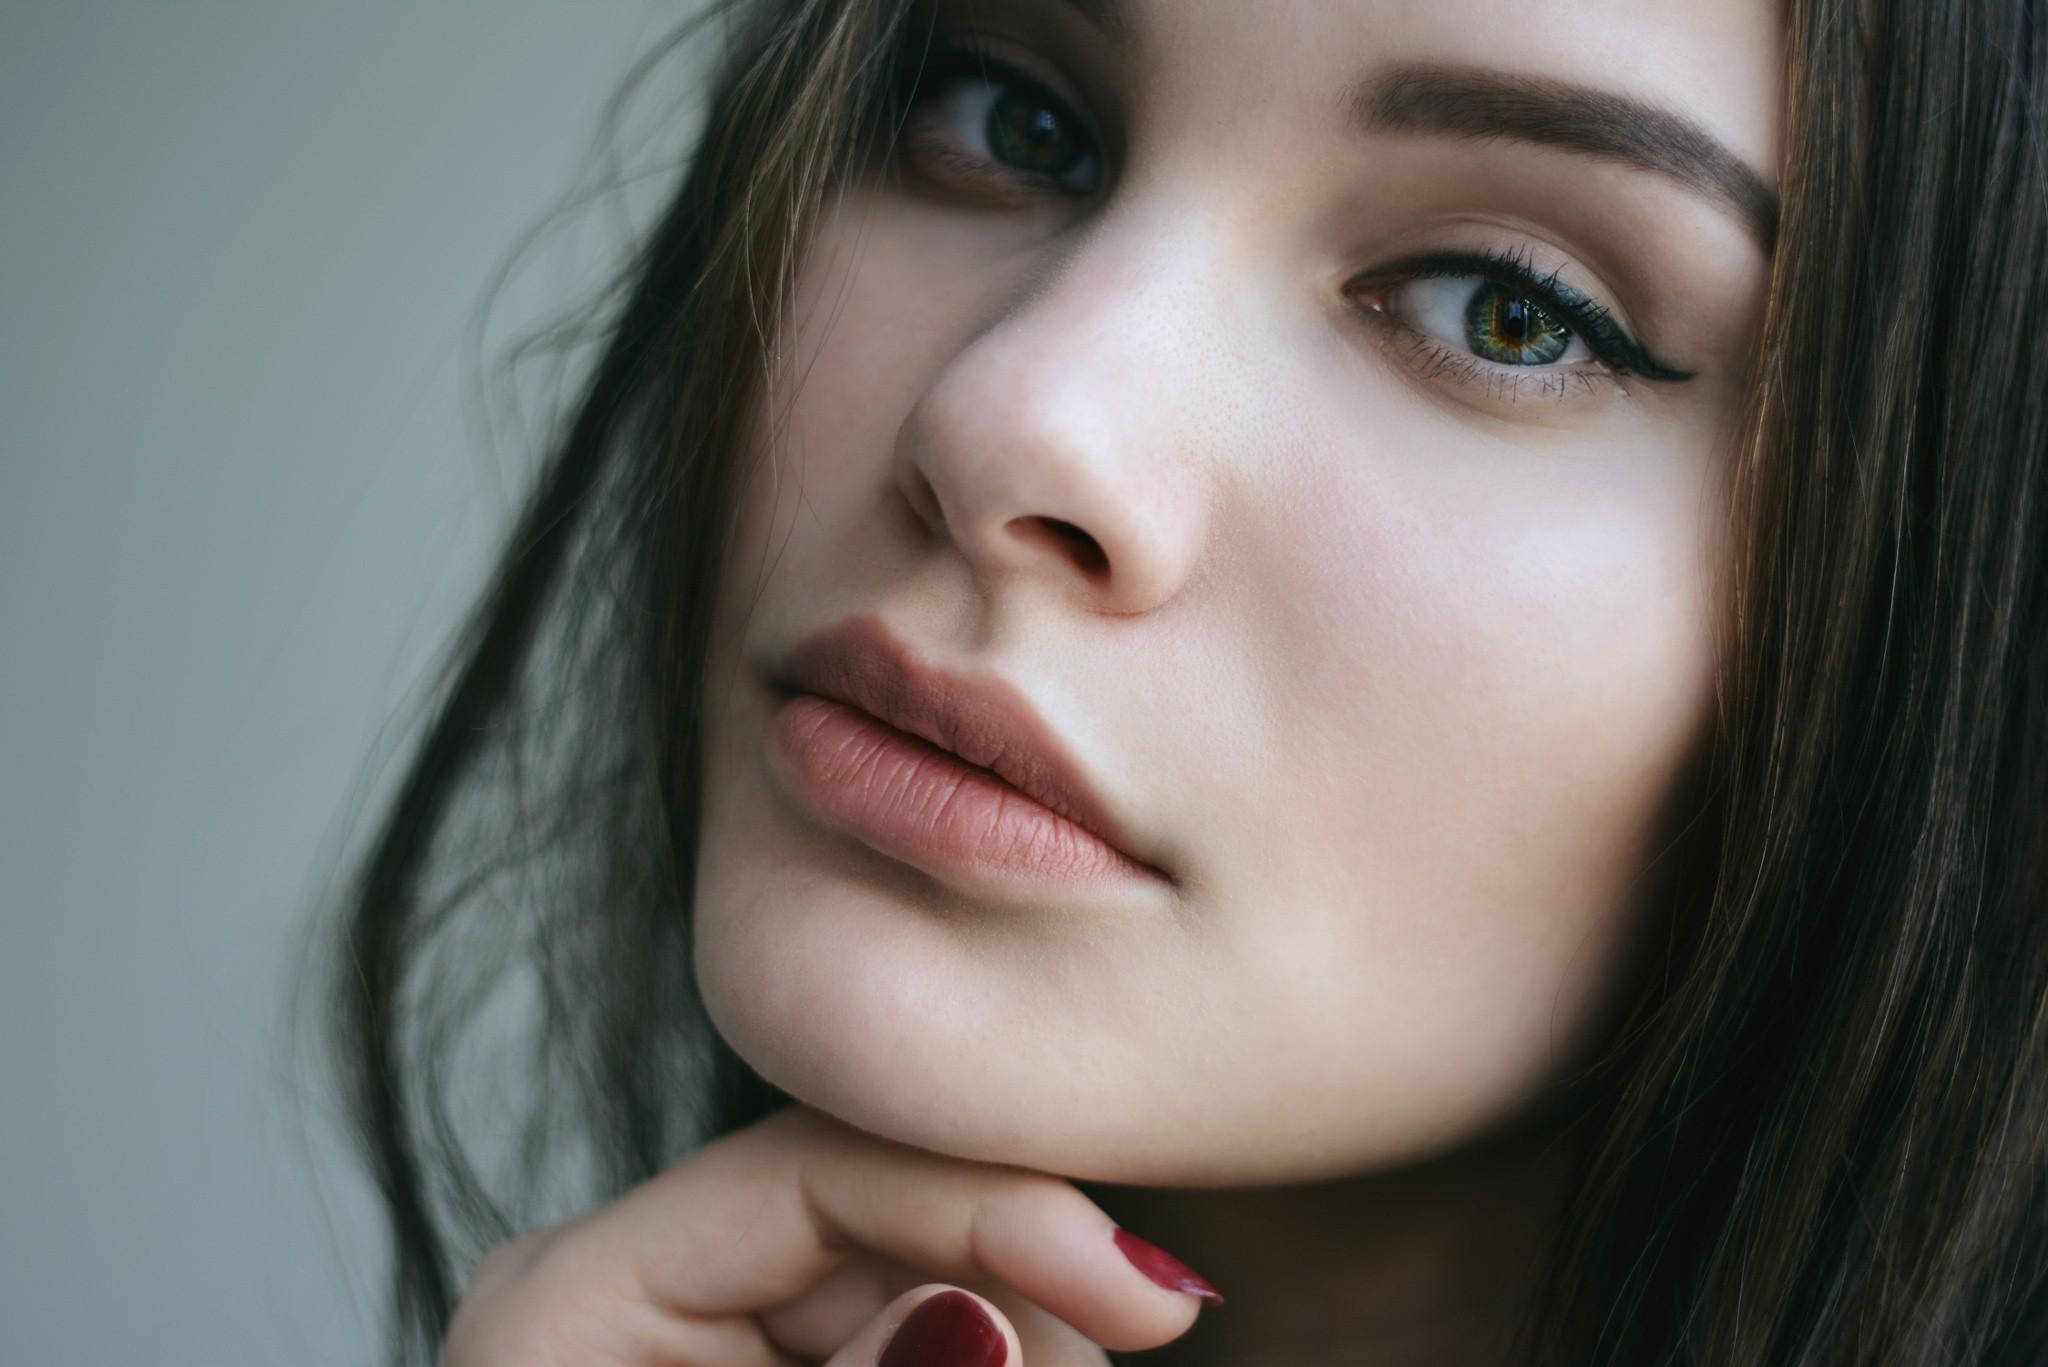 Картинки девушки с курносым носом